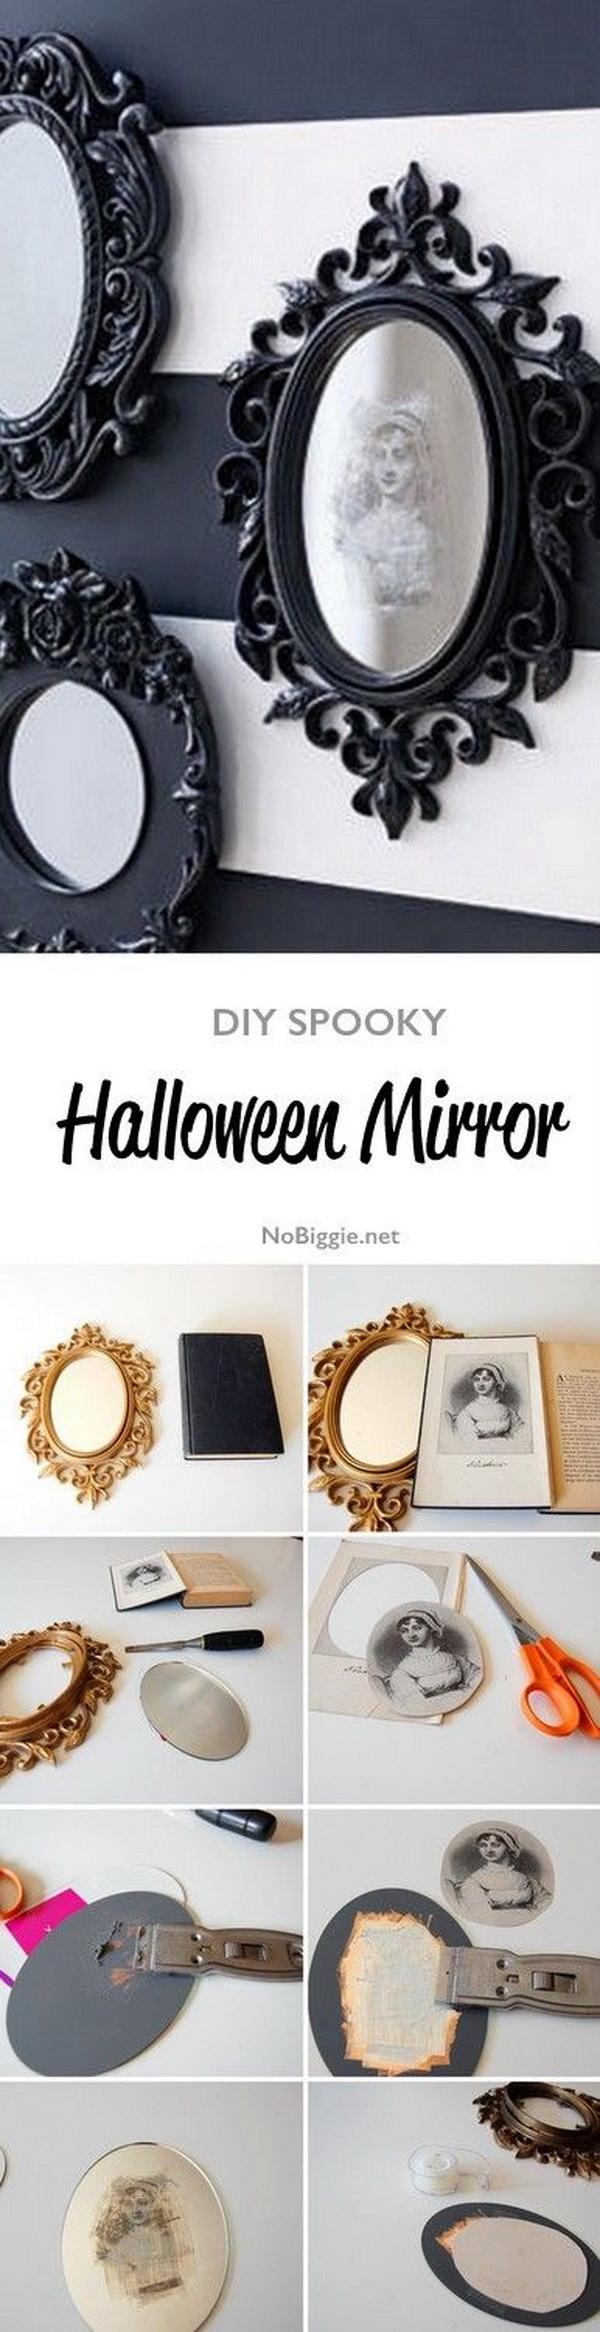 DIY Spooky Halloween Mirror.